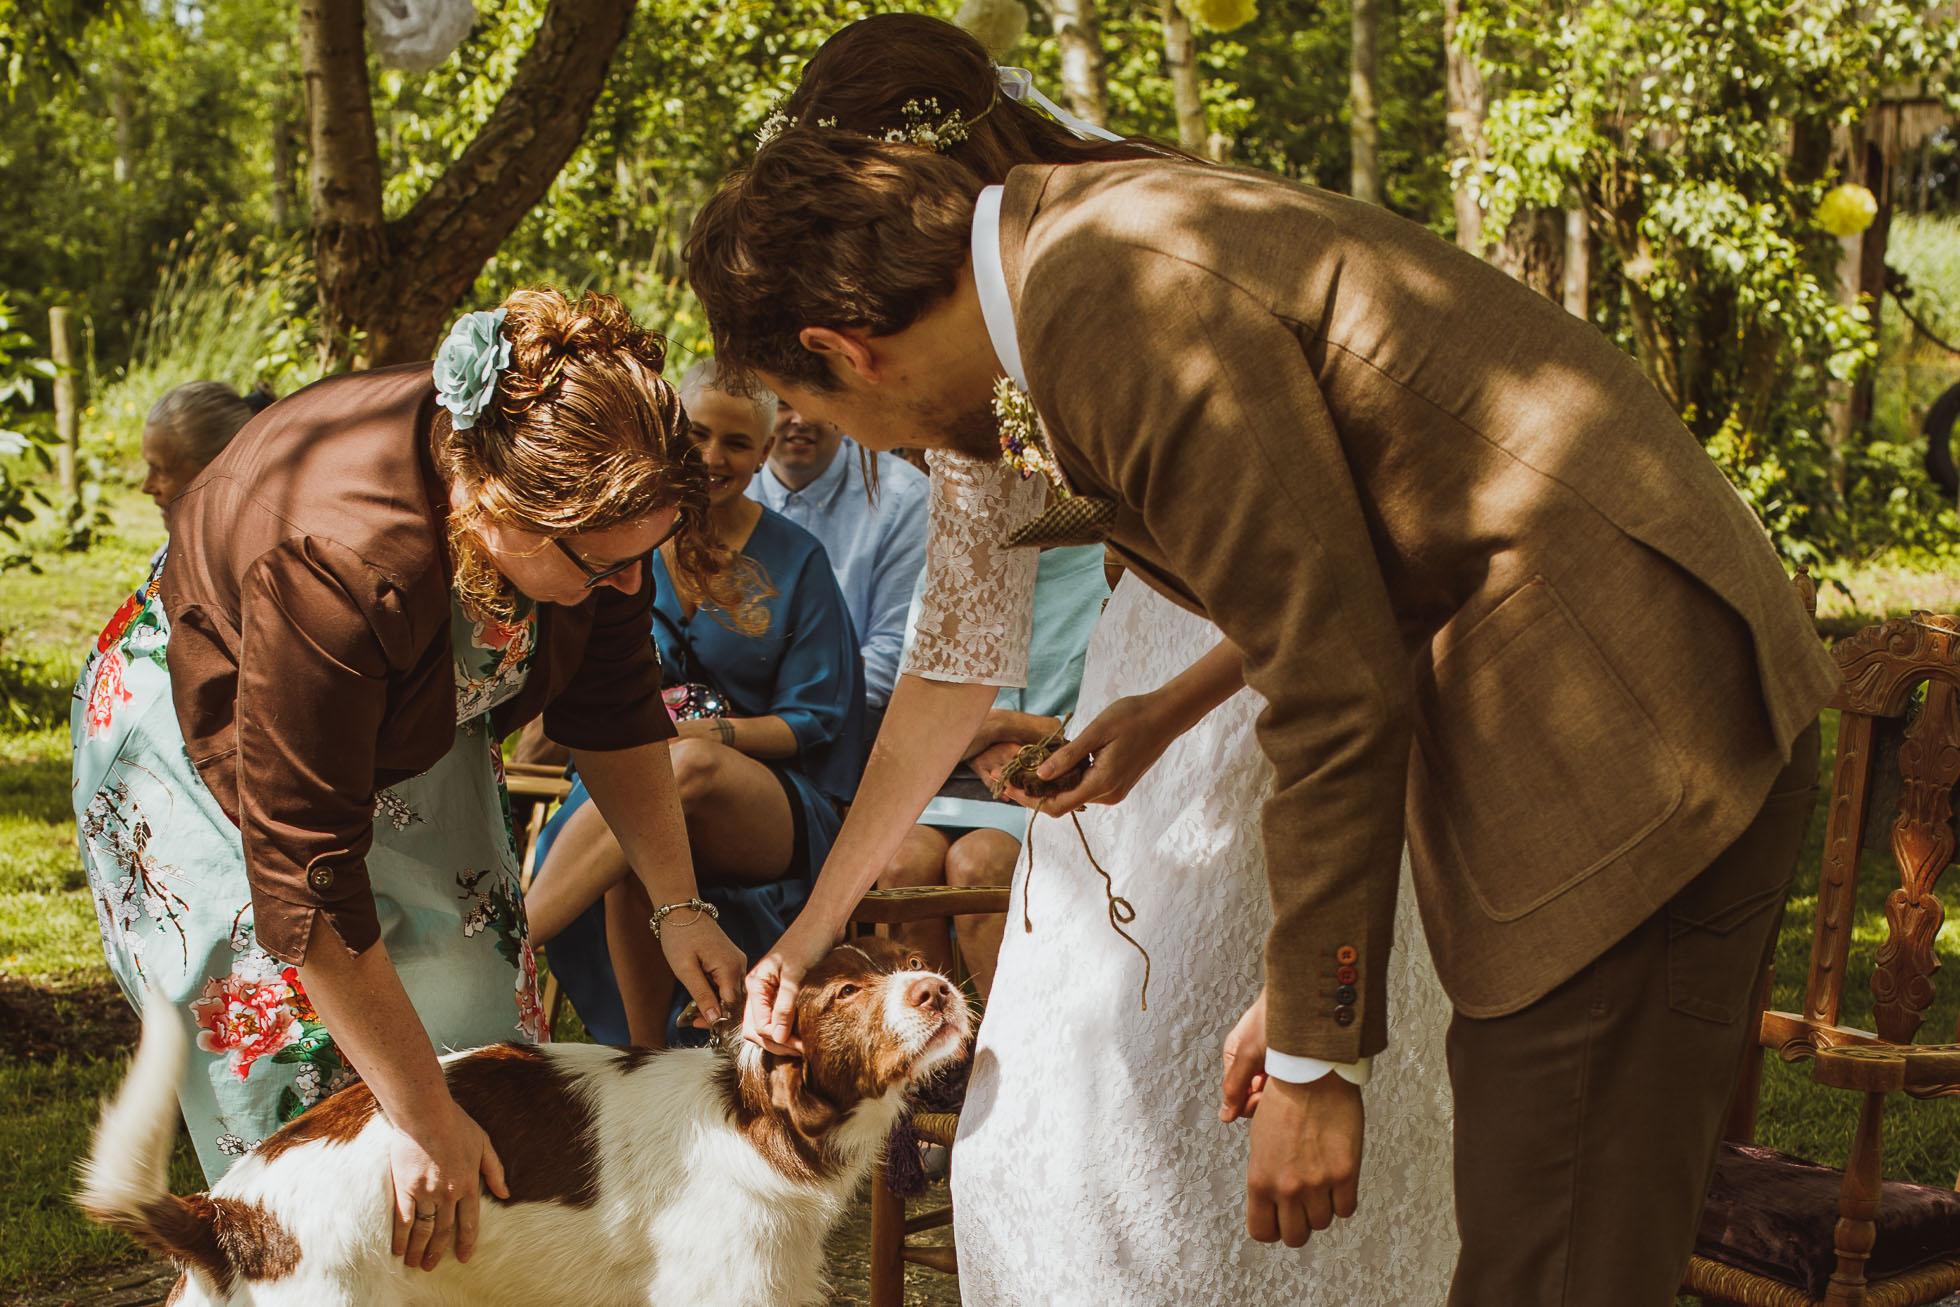 utrecht-wedding-photographer-71.jpg